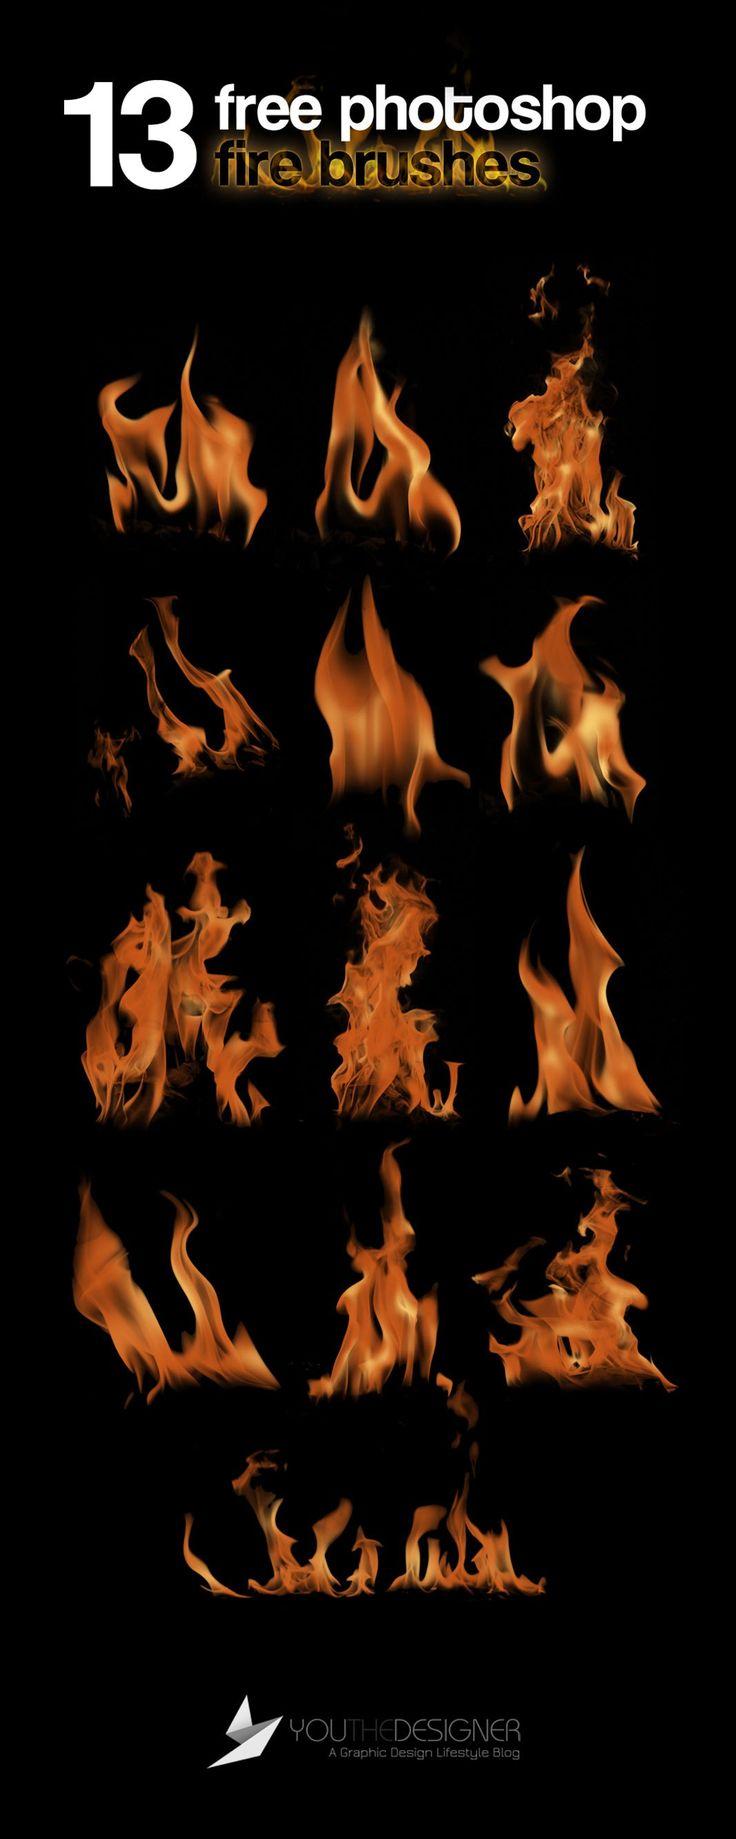 13 Free Photoshop Fire Brushes